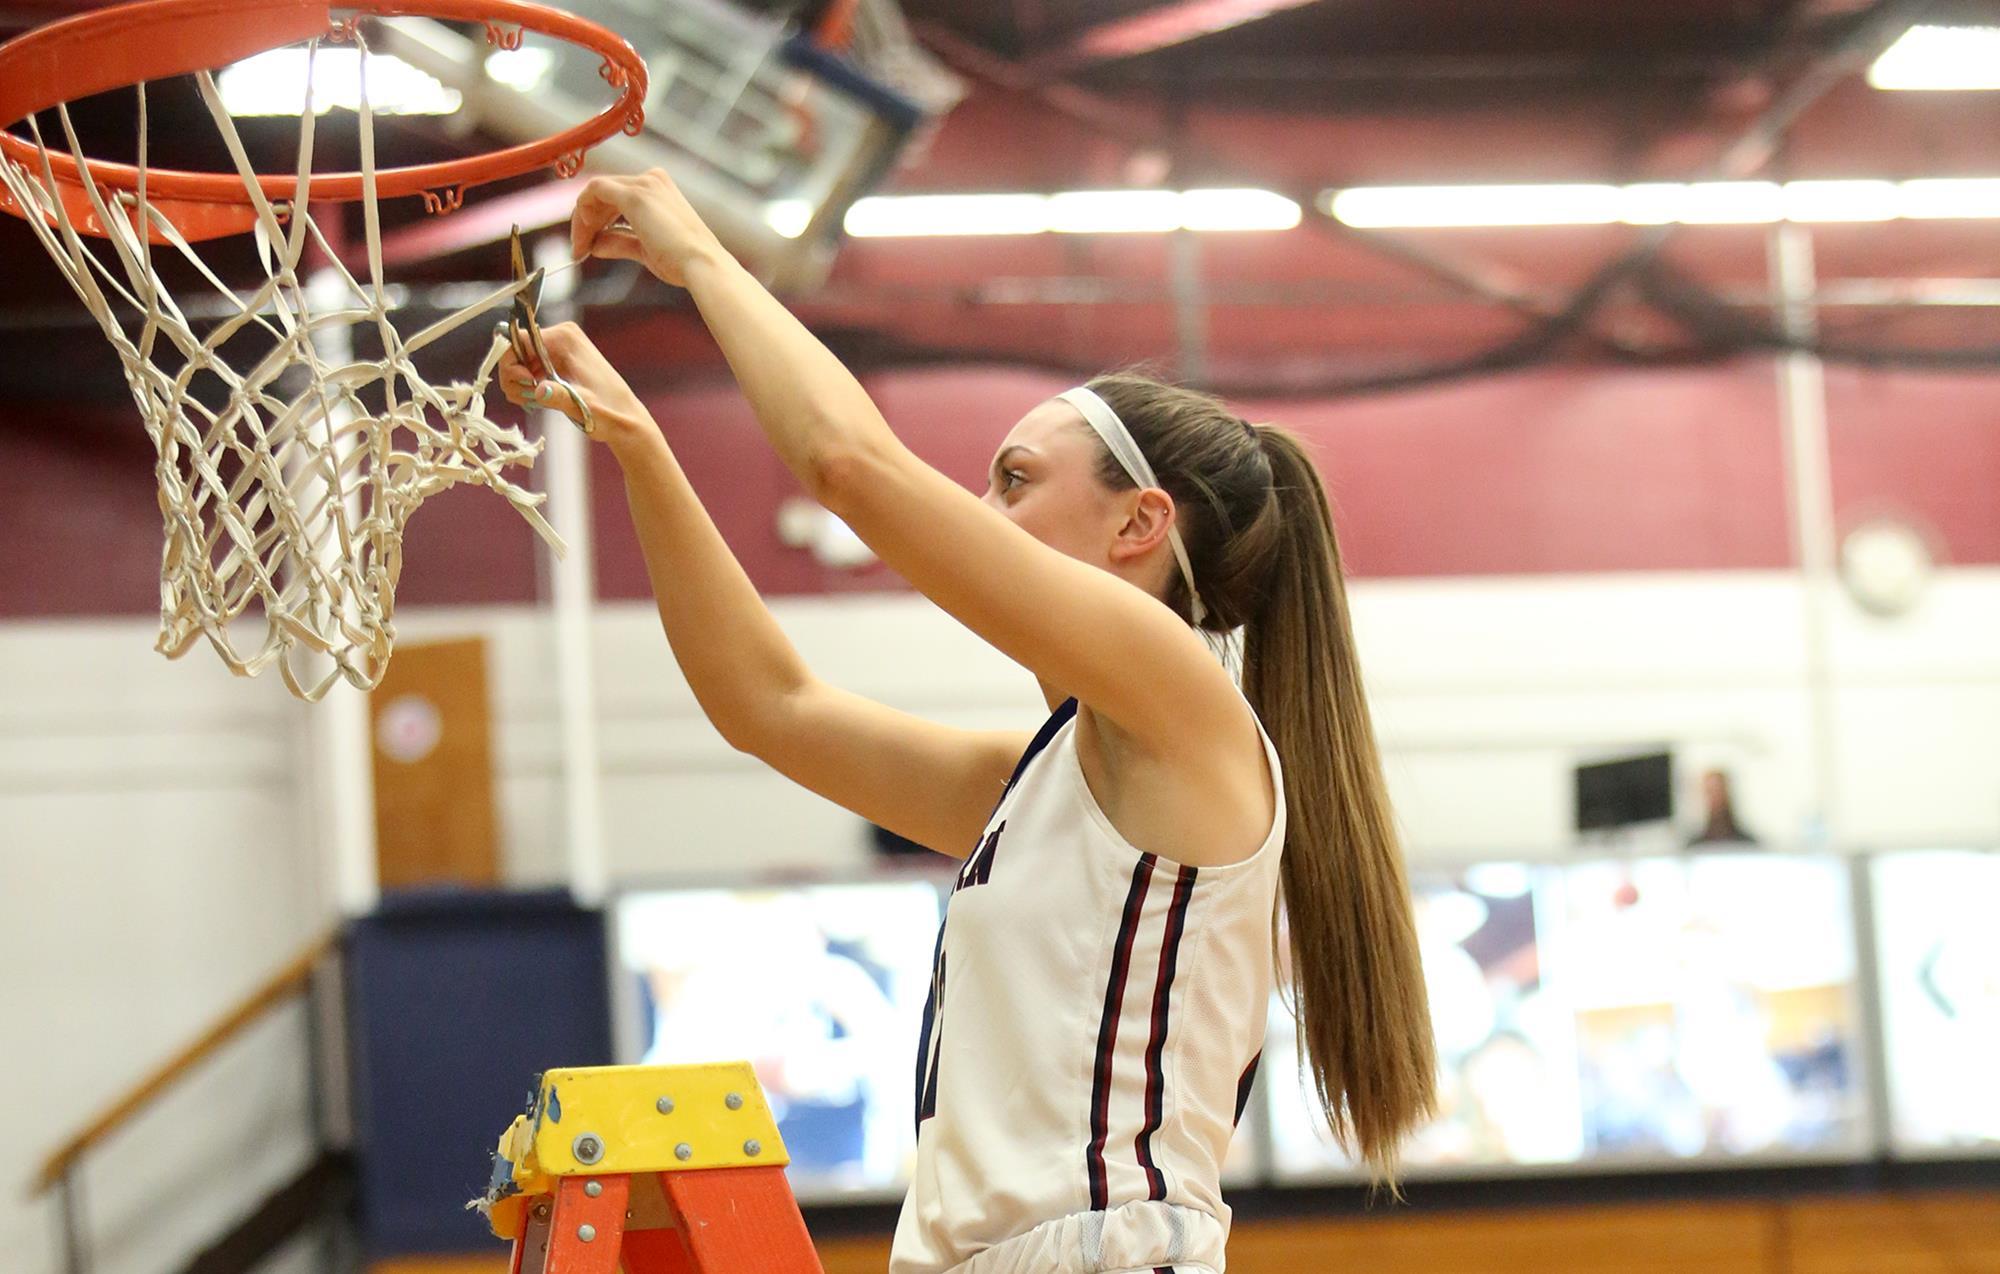 Marissa Shirshac - 2019 20 - Women'S Basketball - Eastern In Eastern Connecticut State University 2021 2020 Year Calendar